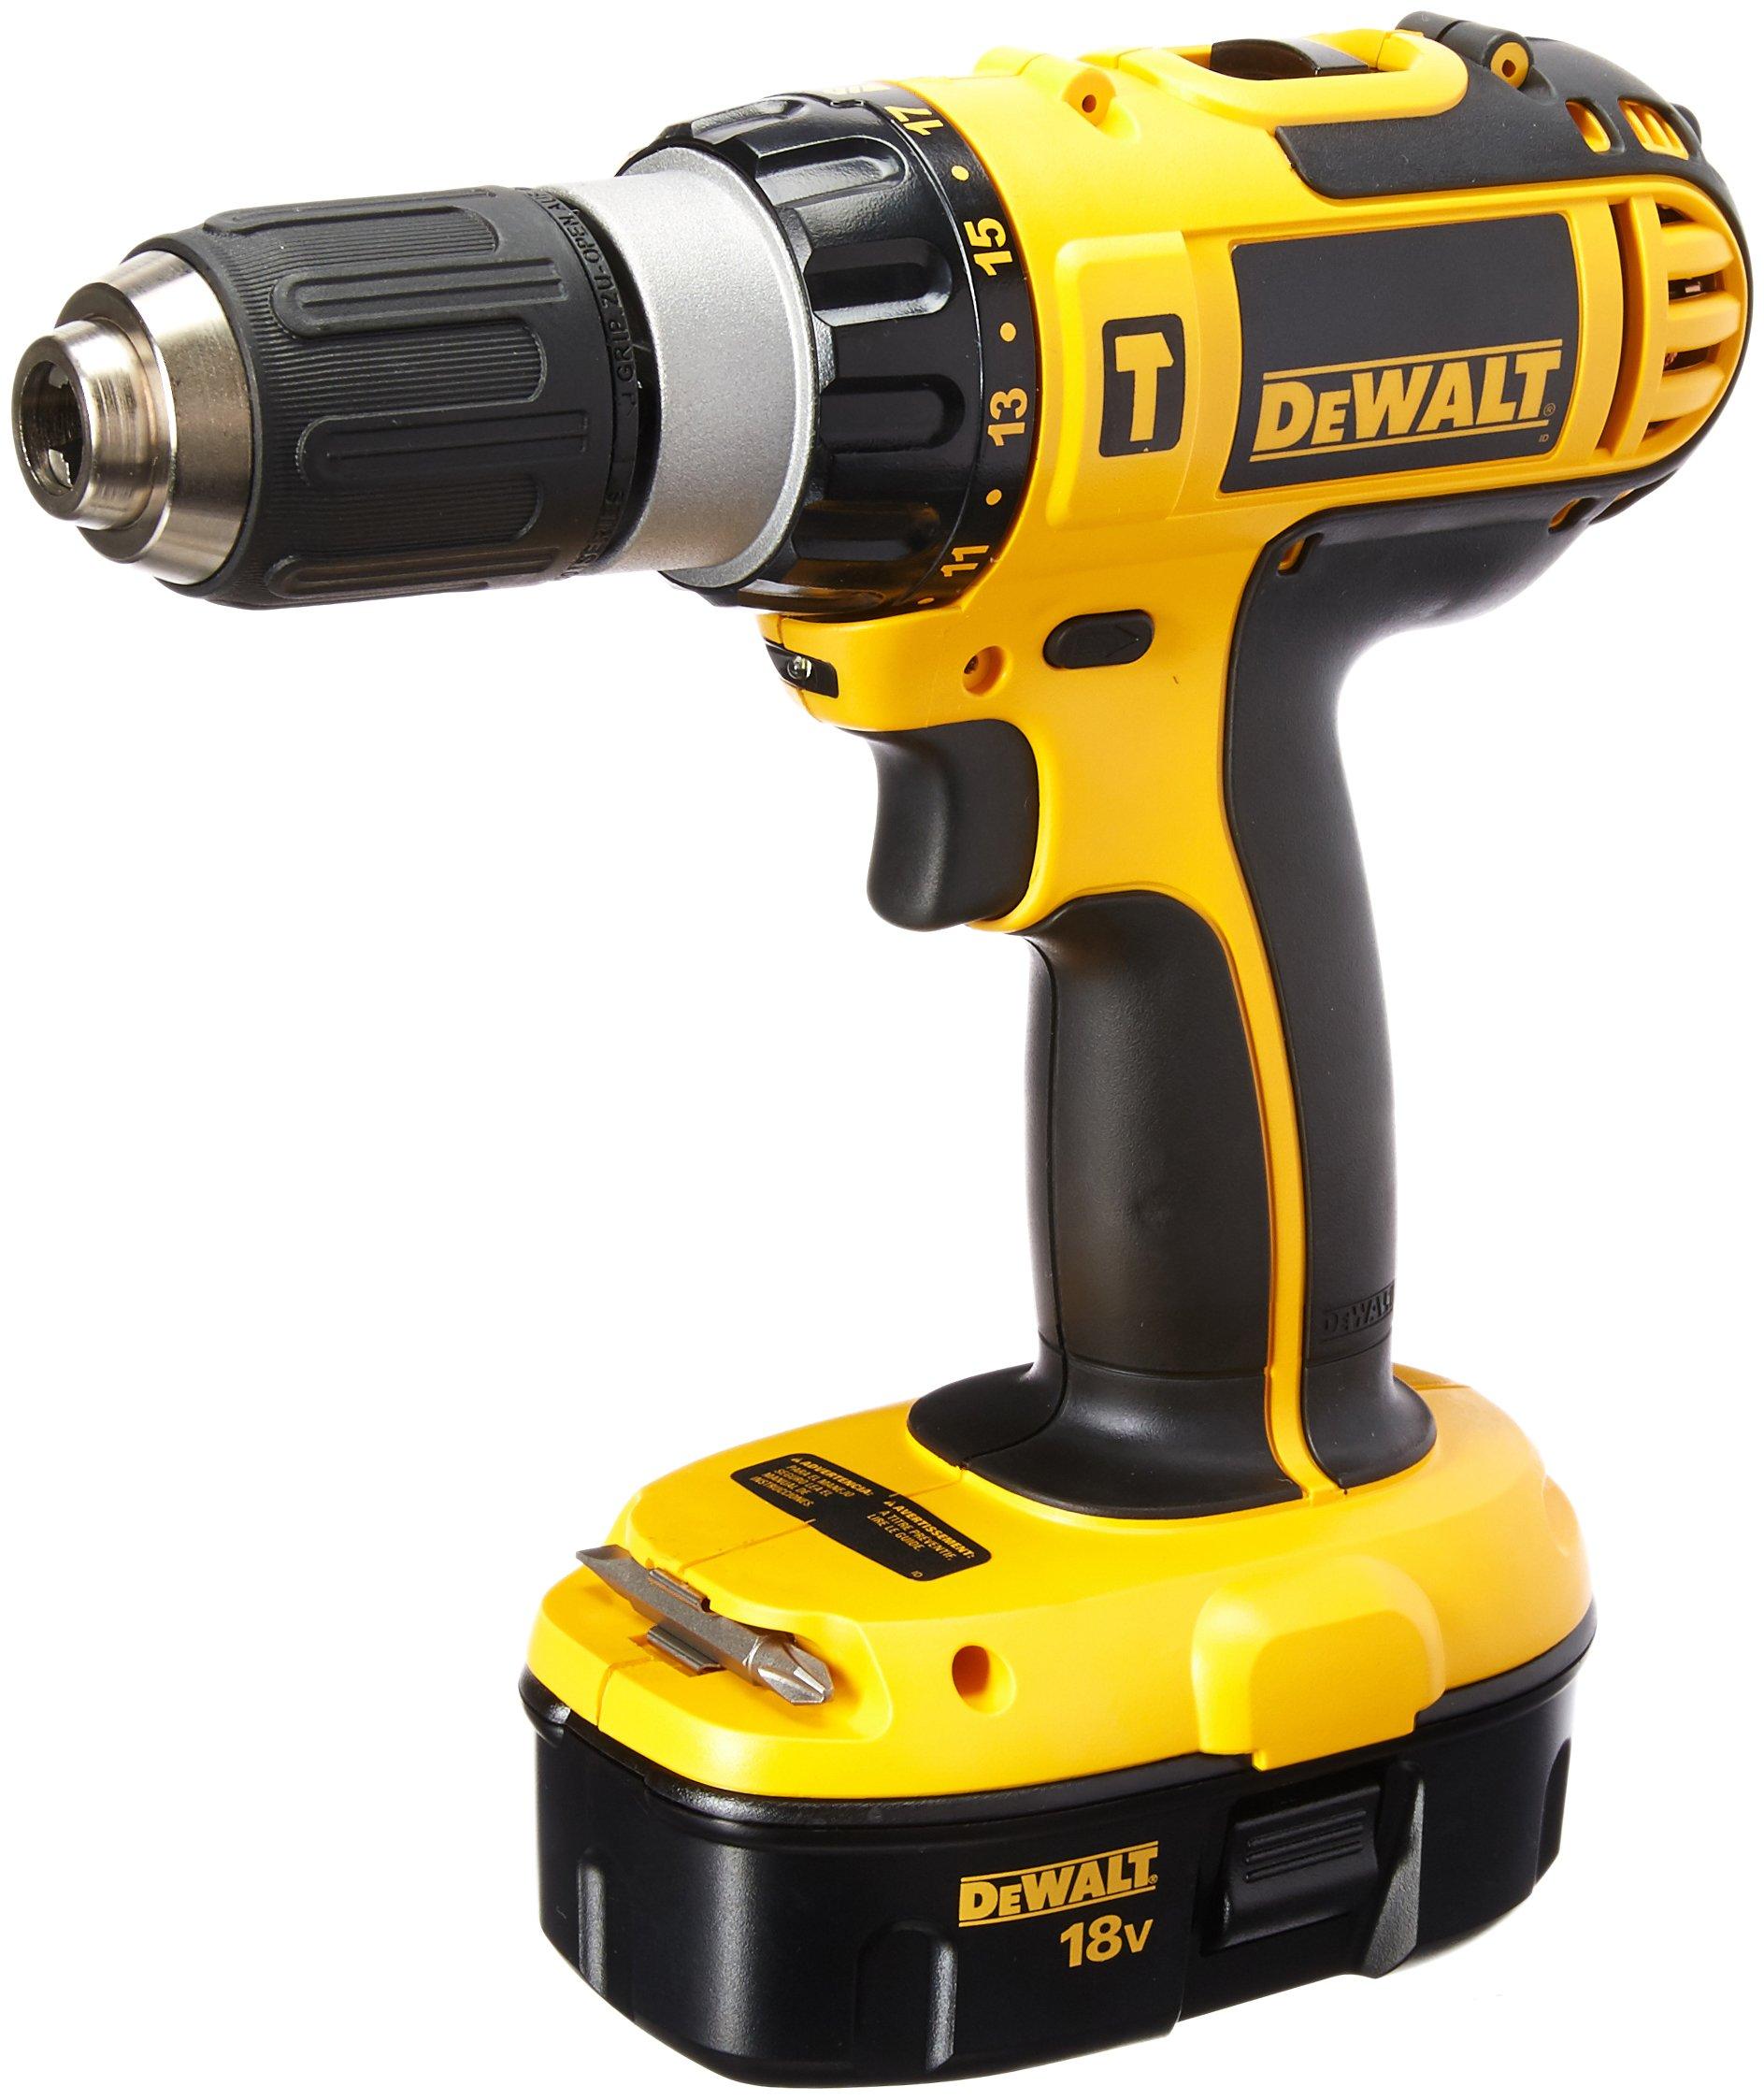 DEWALT DC725K-2, 18-Volt Ni-Cad 1/2 in. Cordless Compact Hammer Drill